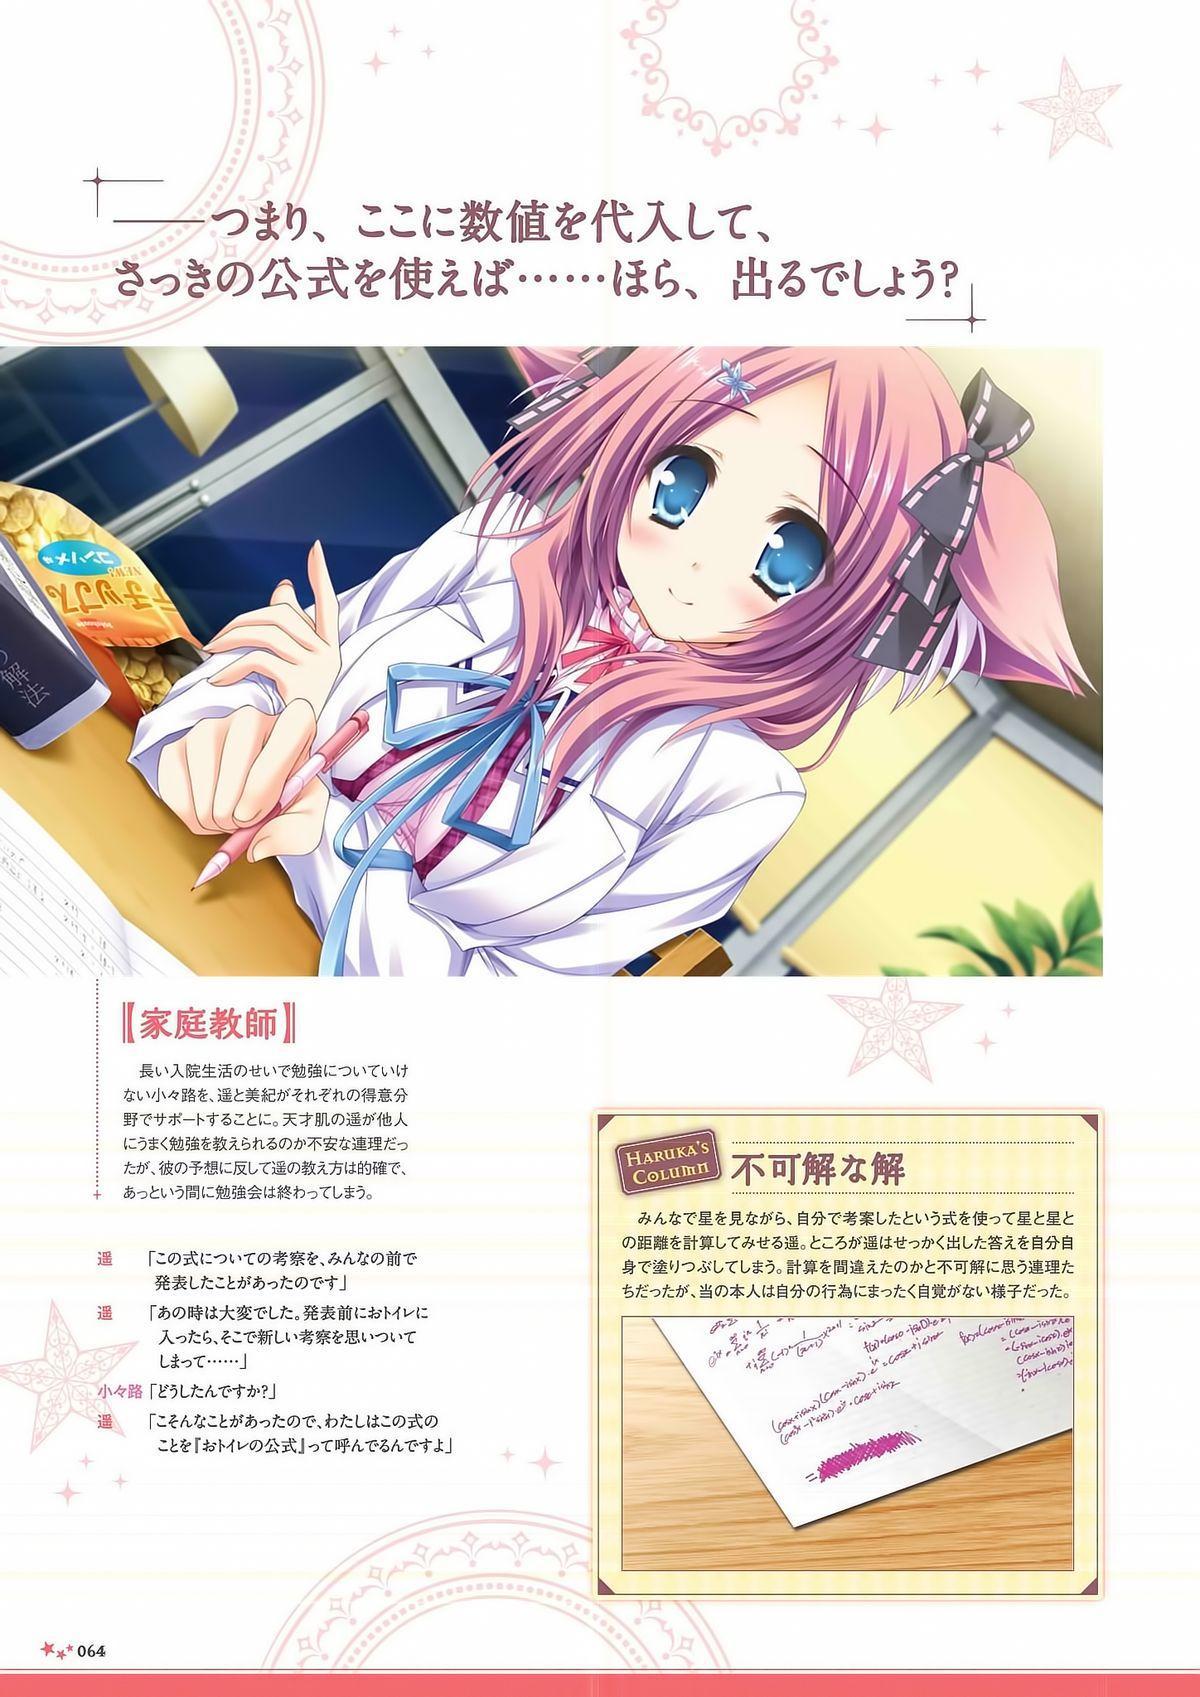 Sekai to Sekai no Mannaka de Visual Fanbook 64